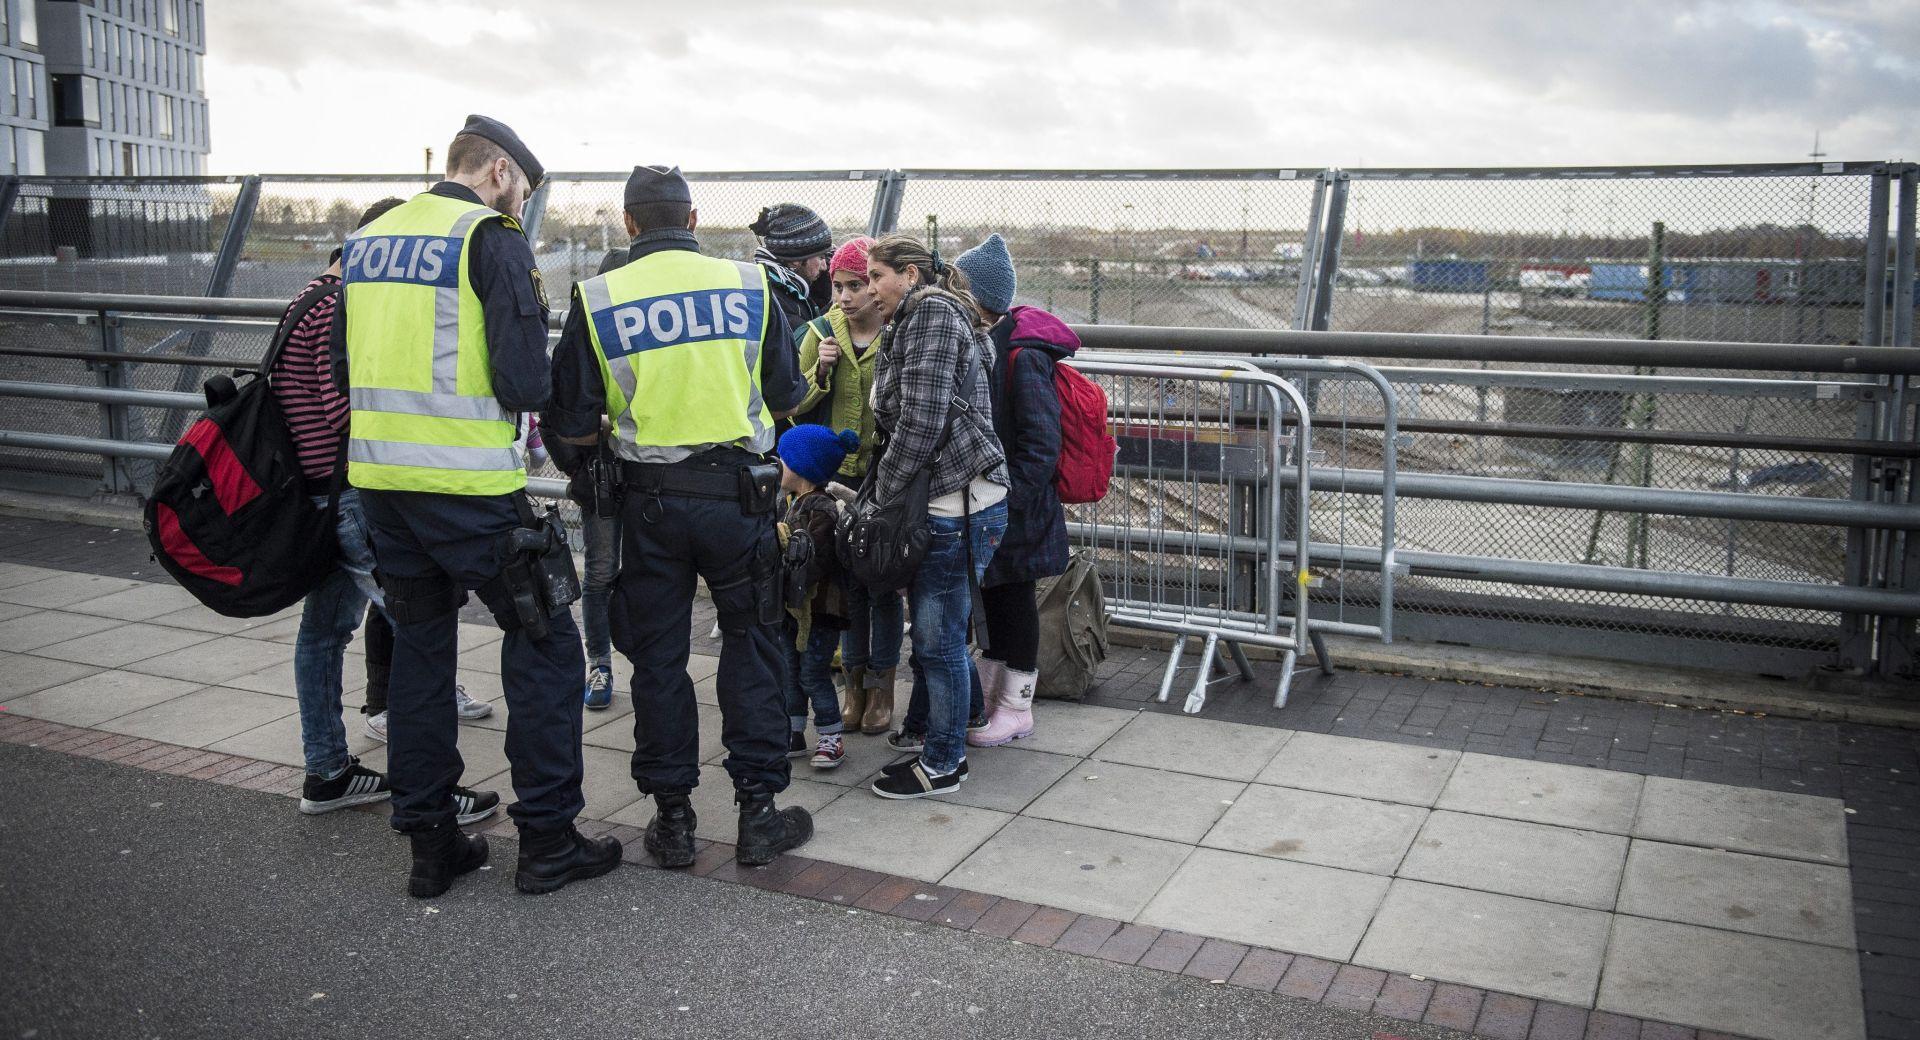 Švedska preplavljena migrantima, ponovo uvela carinske kontrole